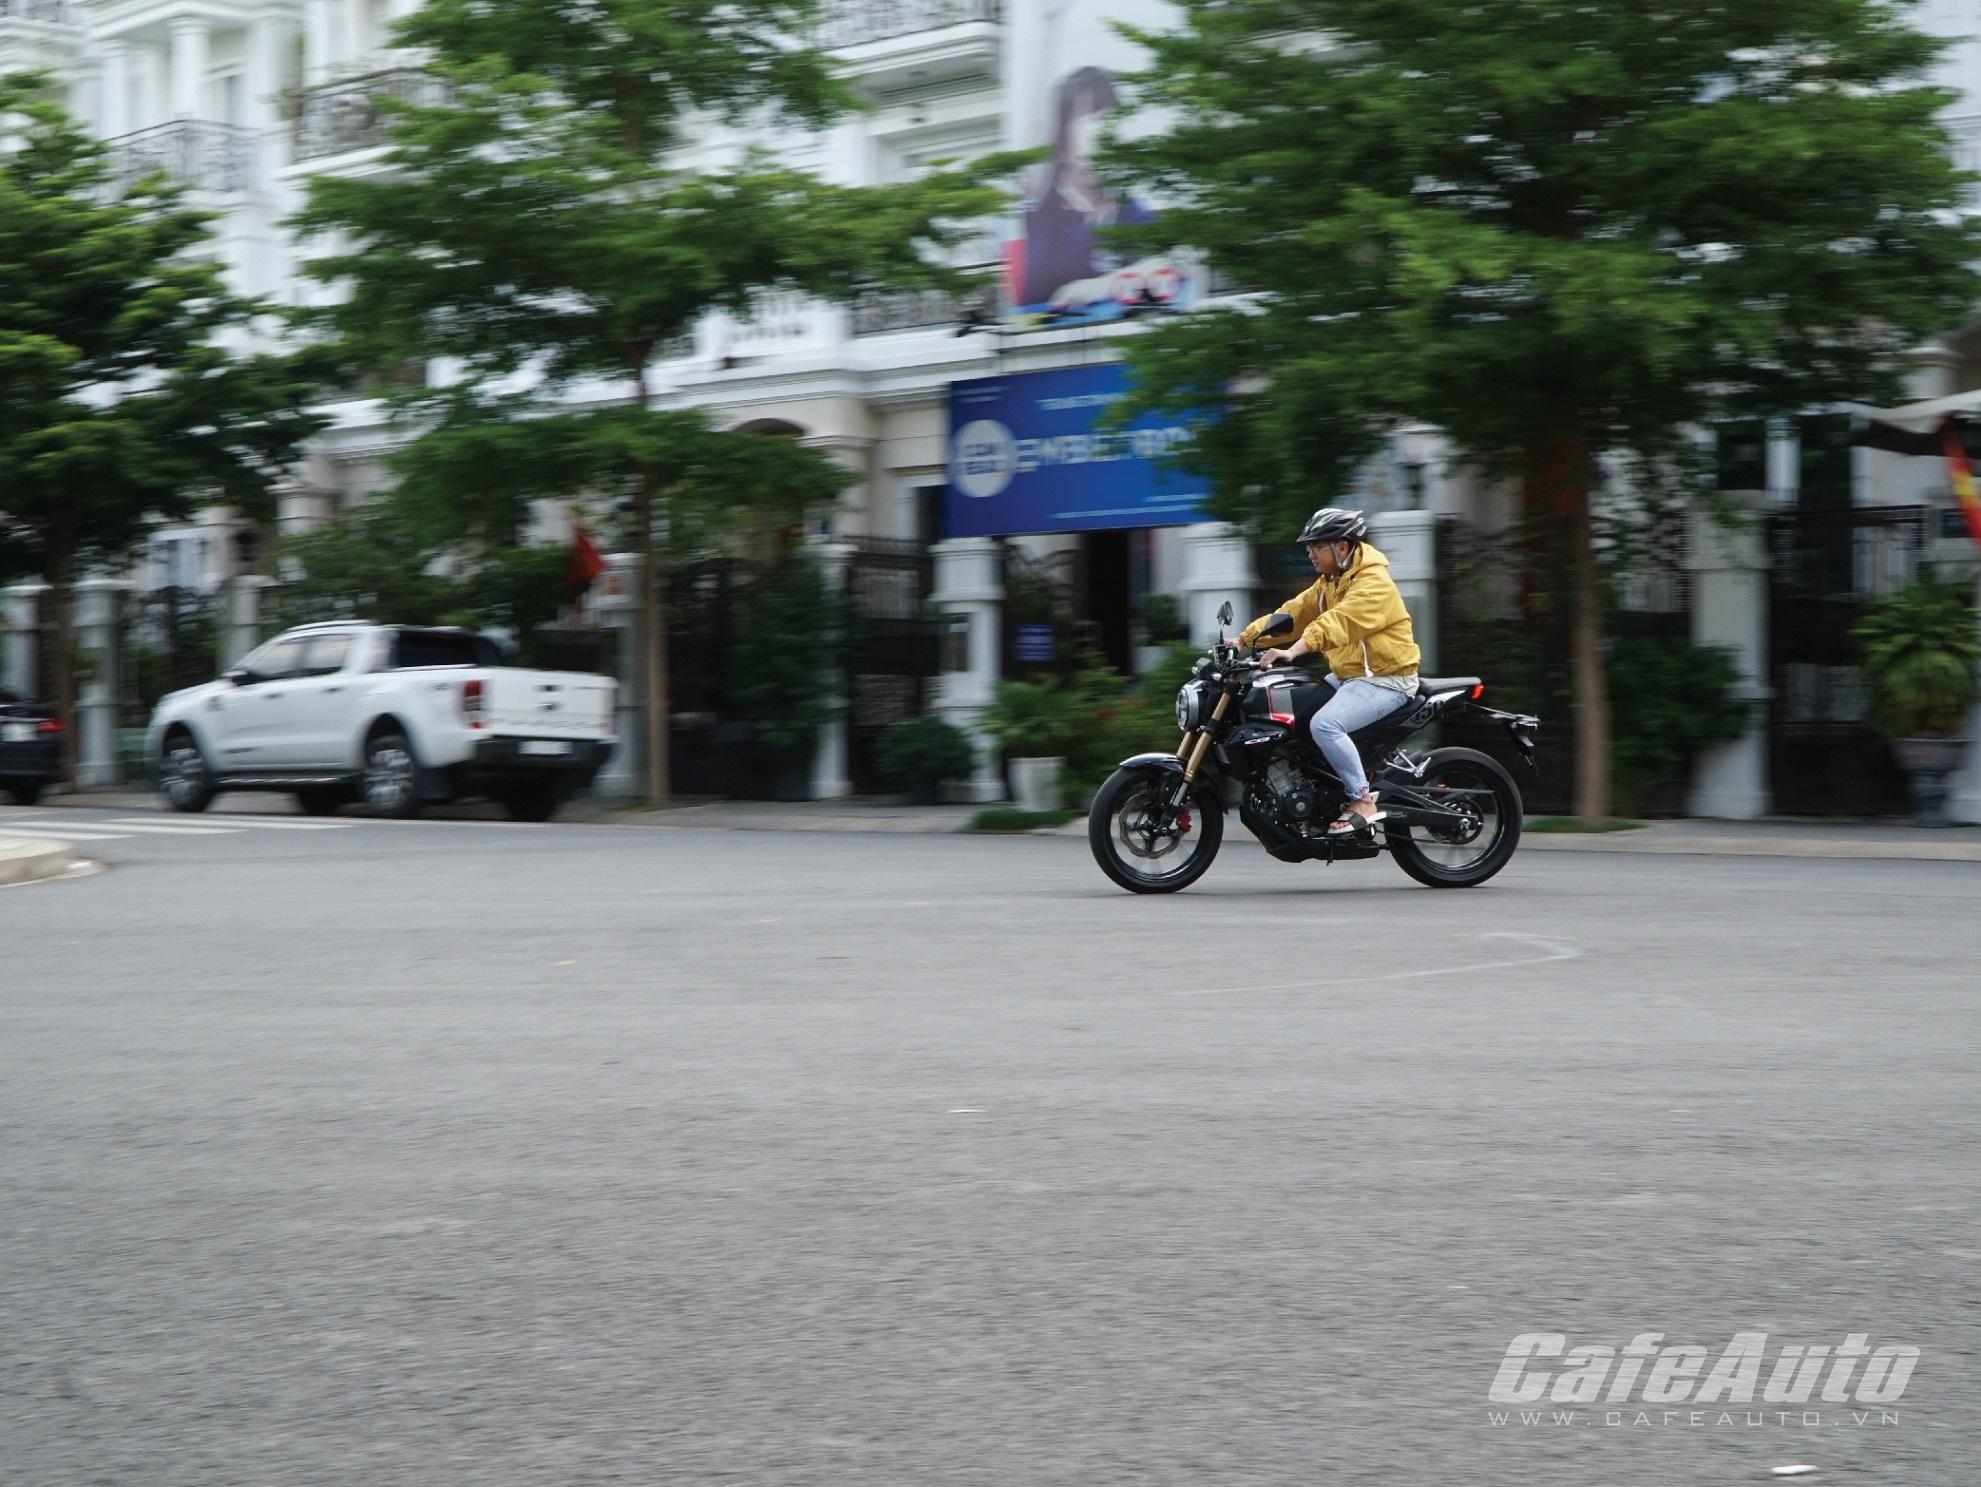 honda-cb150r-qua-thuong-khong-danh-cho-so-dong